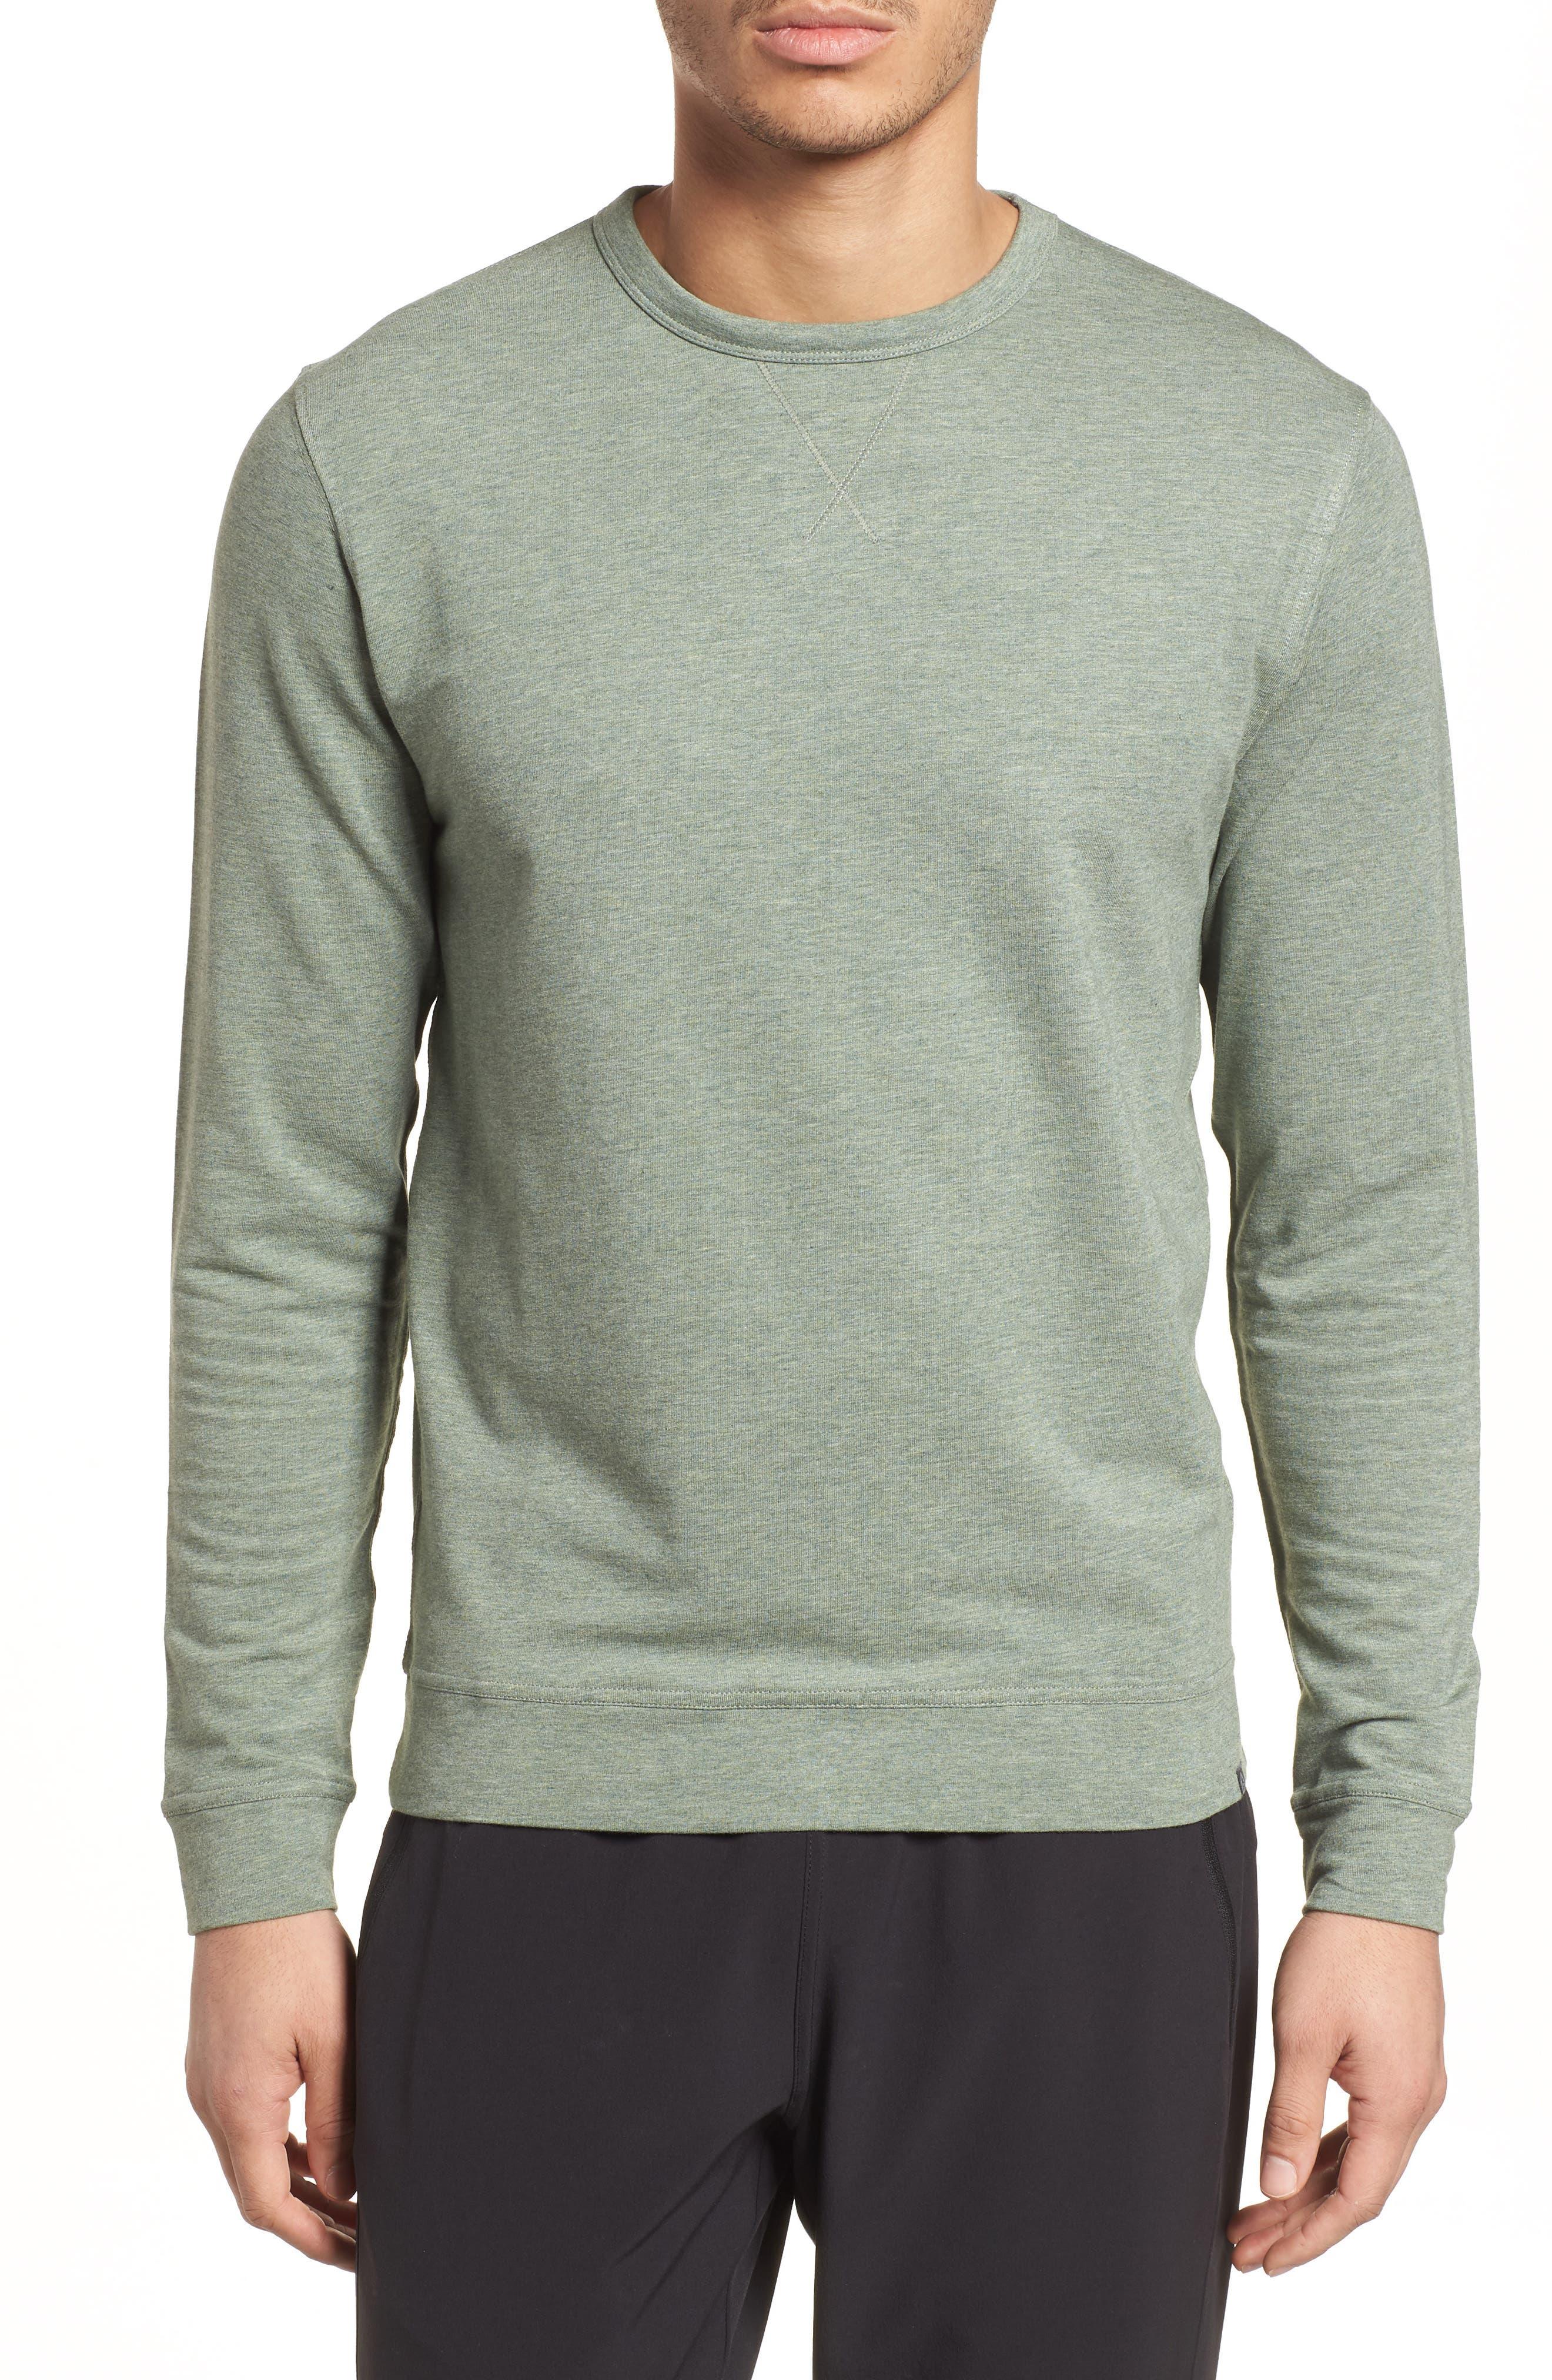 Legacy Crewneck Sweatshirt,                         Main,                         color, Kelp Heather